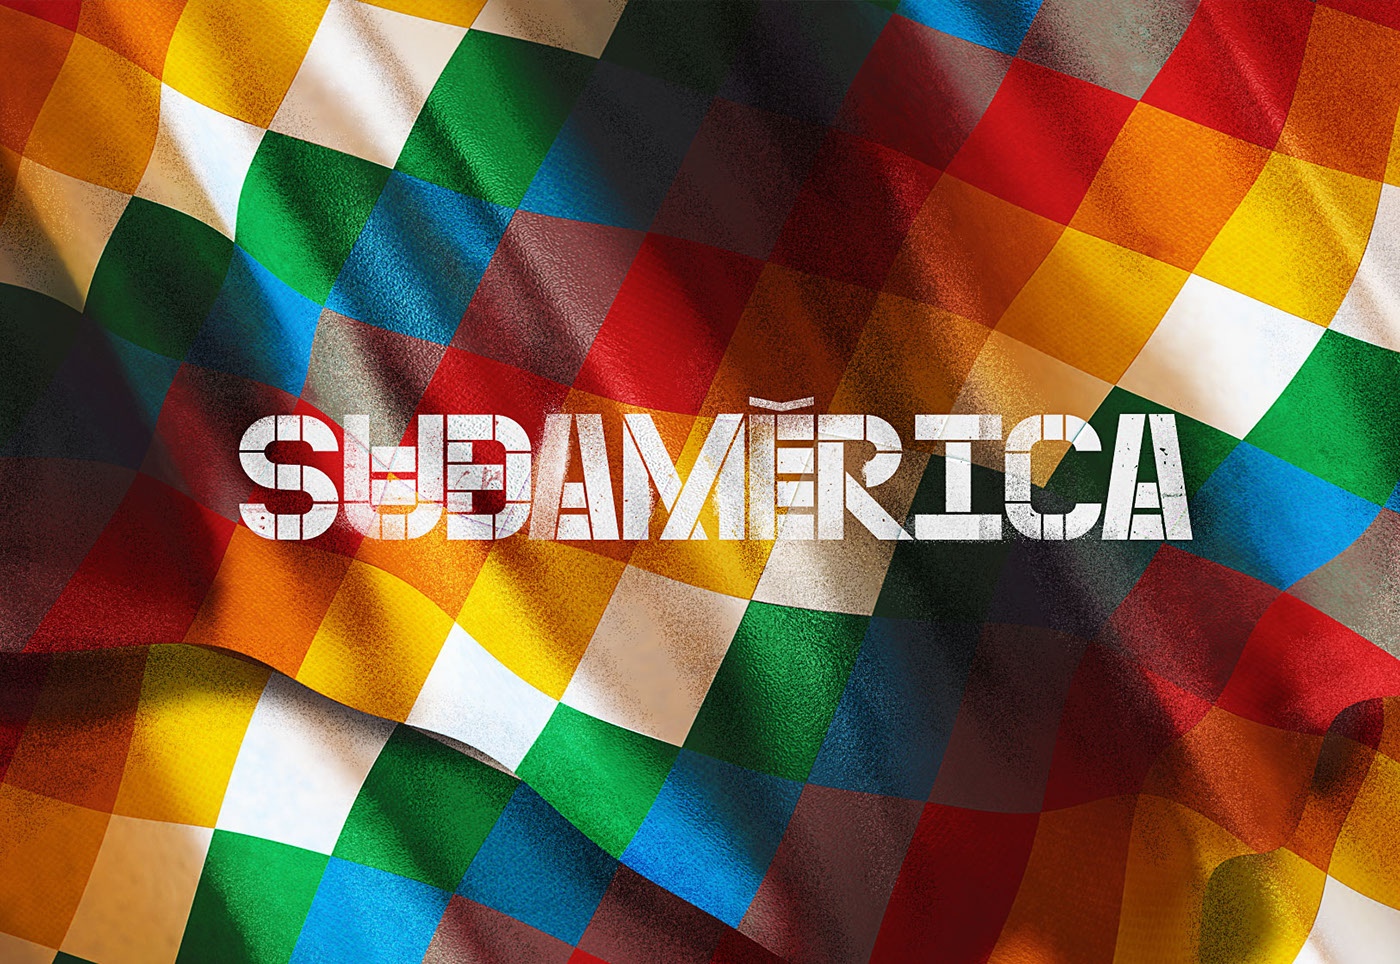 sudamerica argentina Brazil peru chile Ecuador uruguay paraguay south america america del sur bolivia colombia venezuela